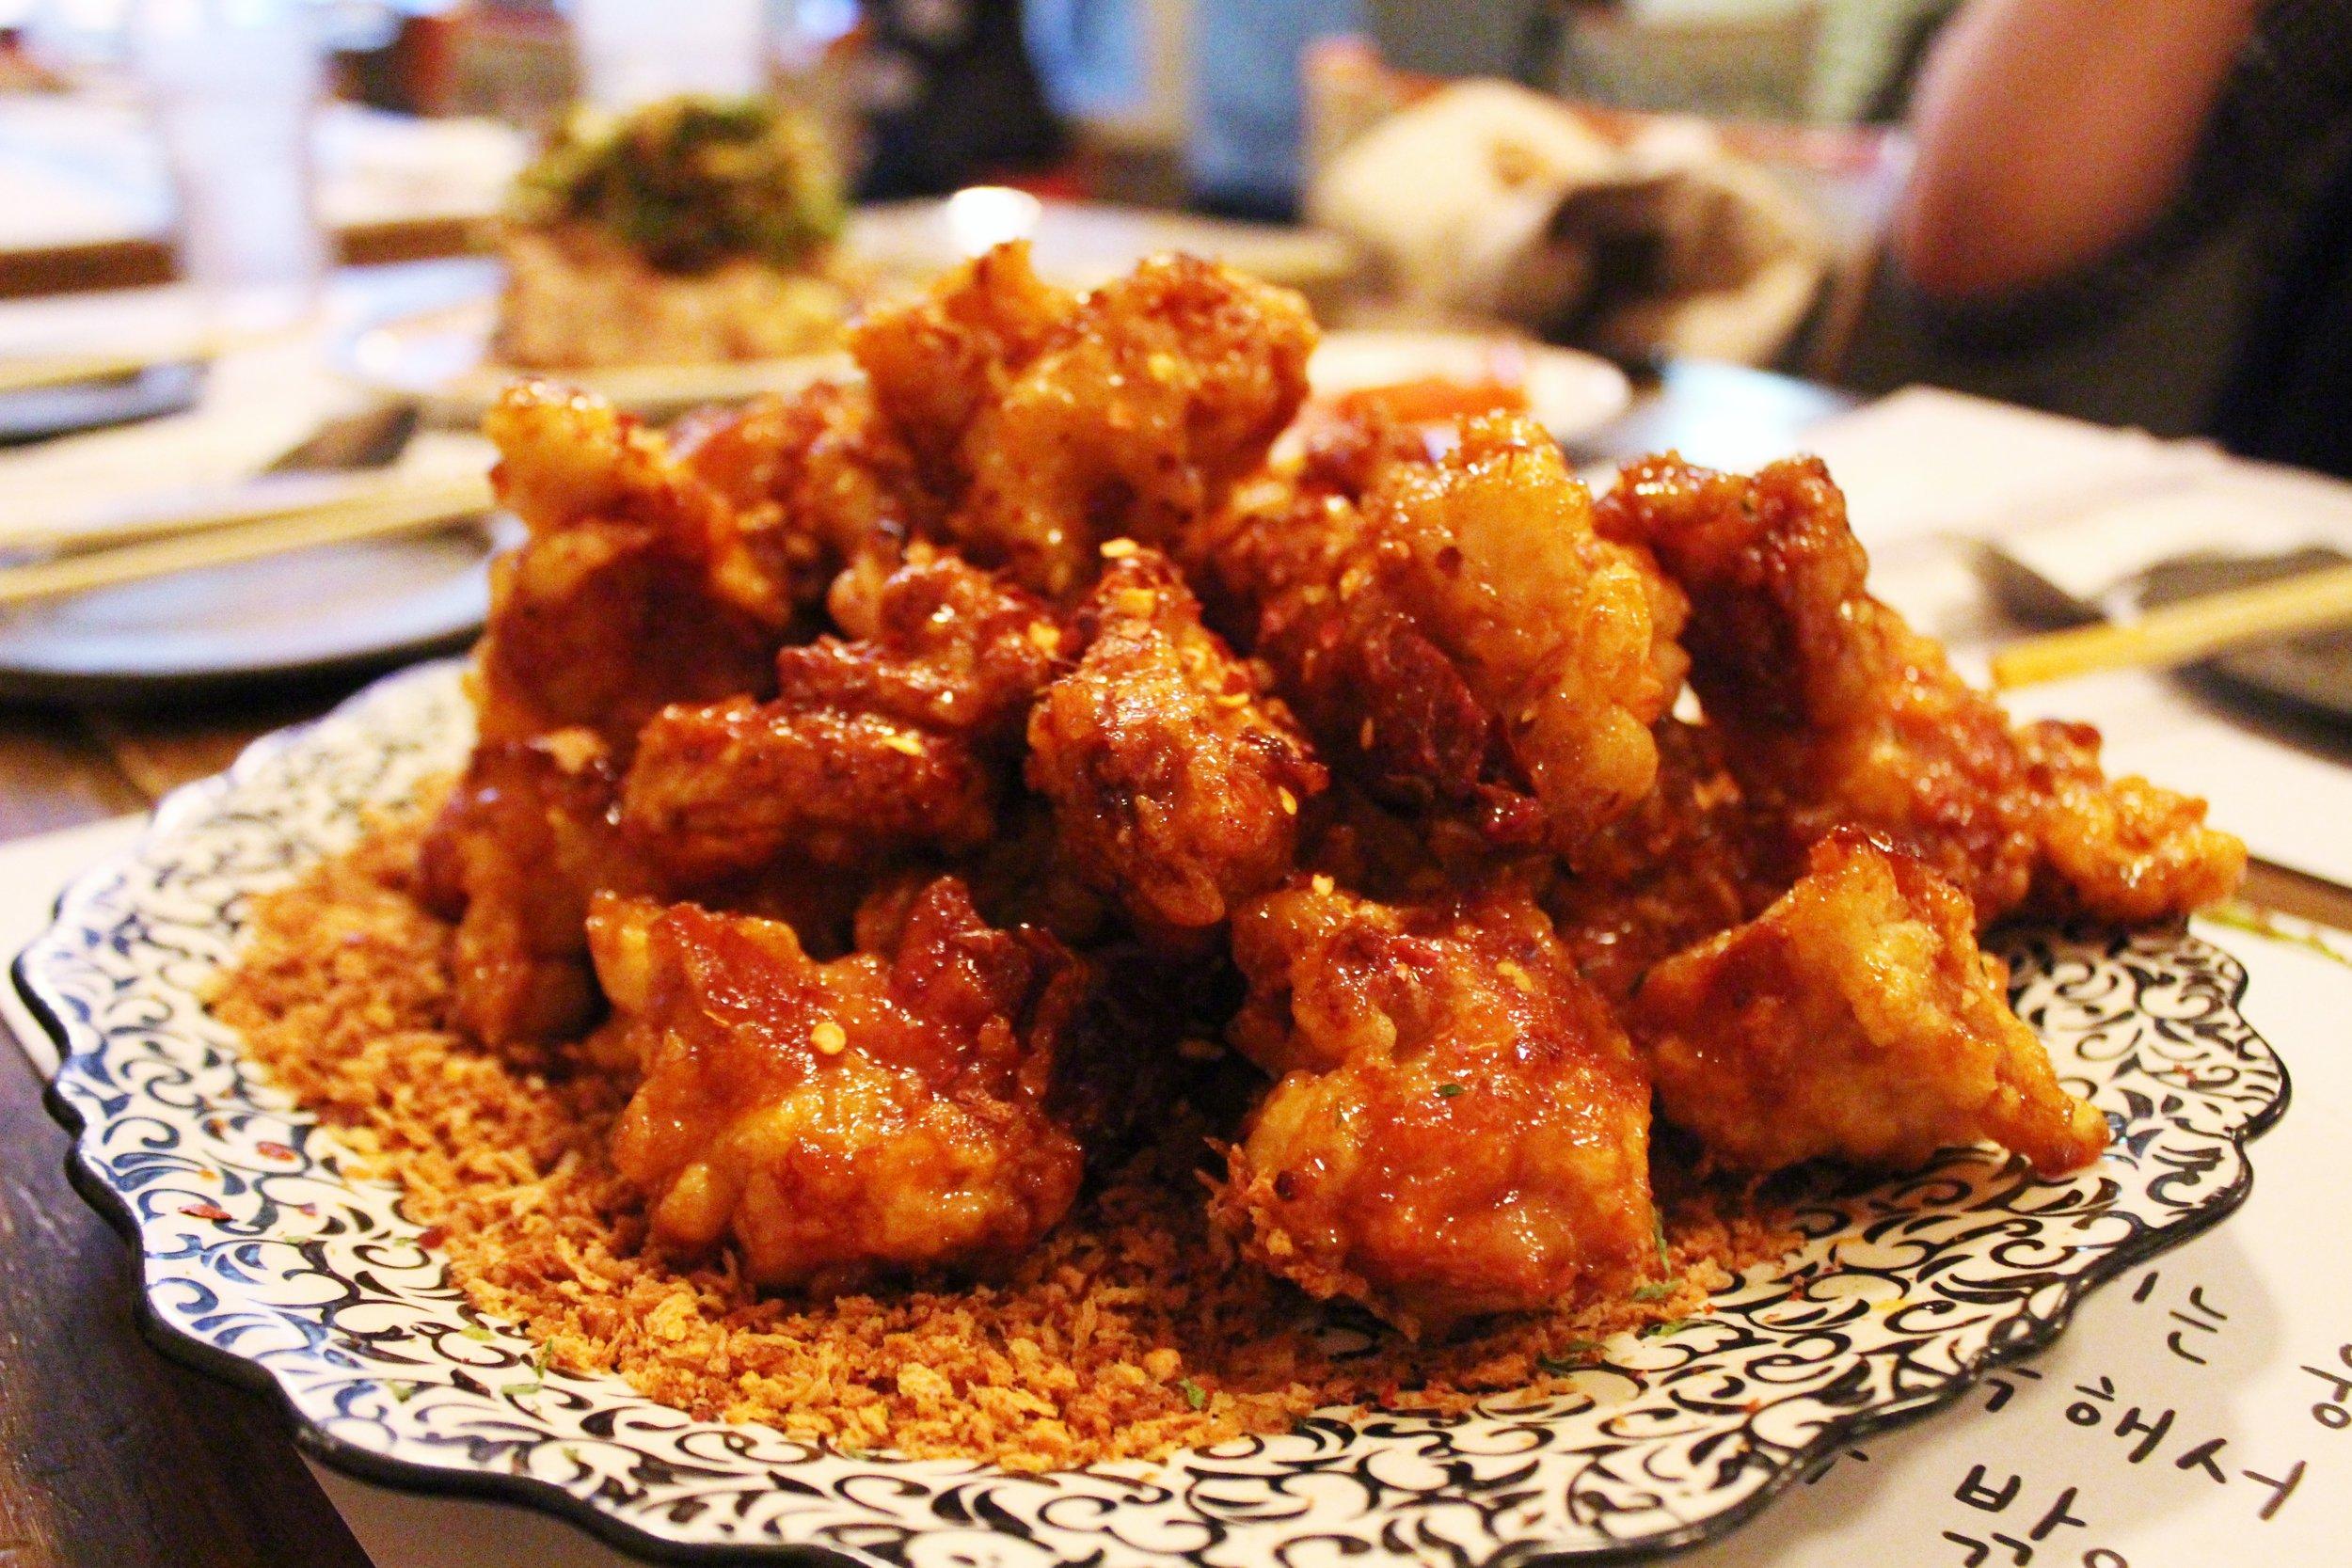 Garlic Crust and Spicy Crispy Chicken at Take31